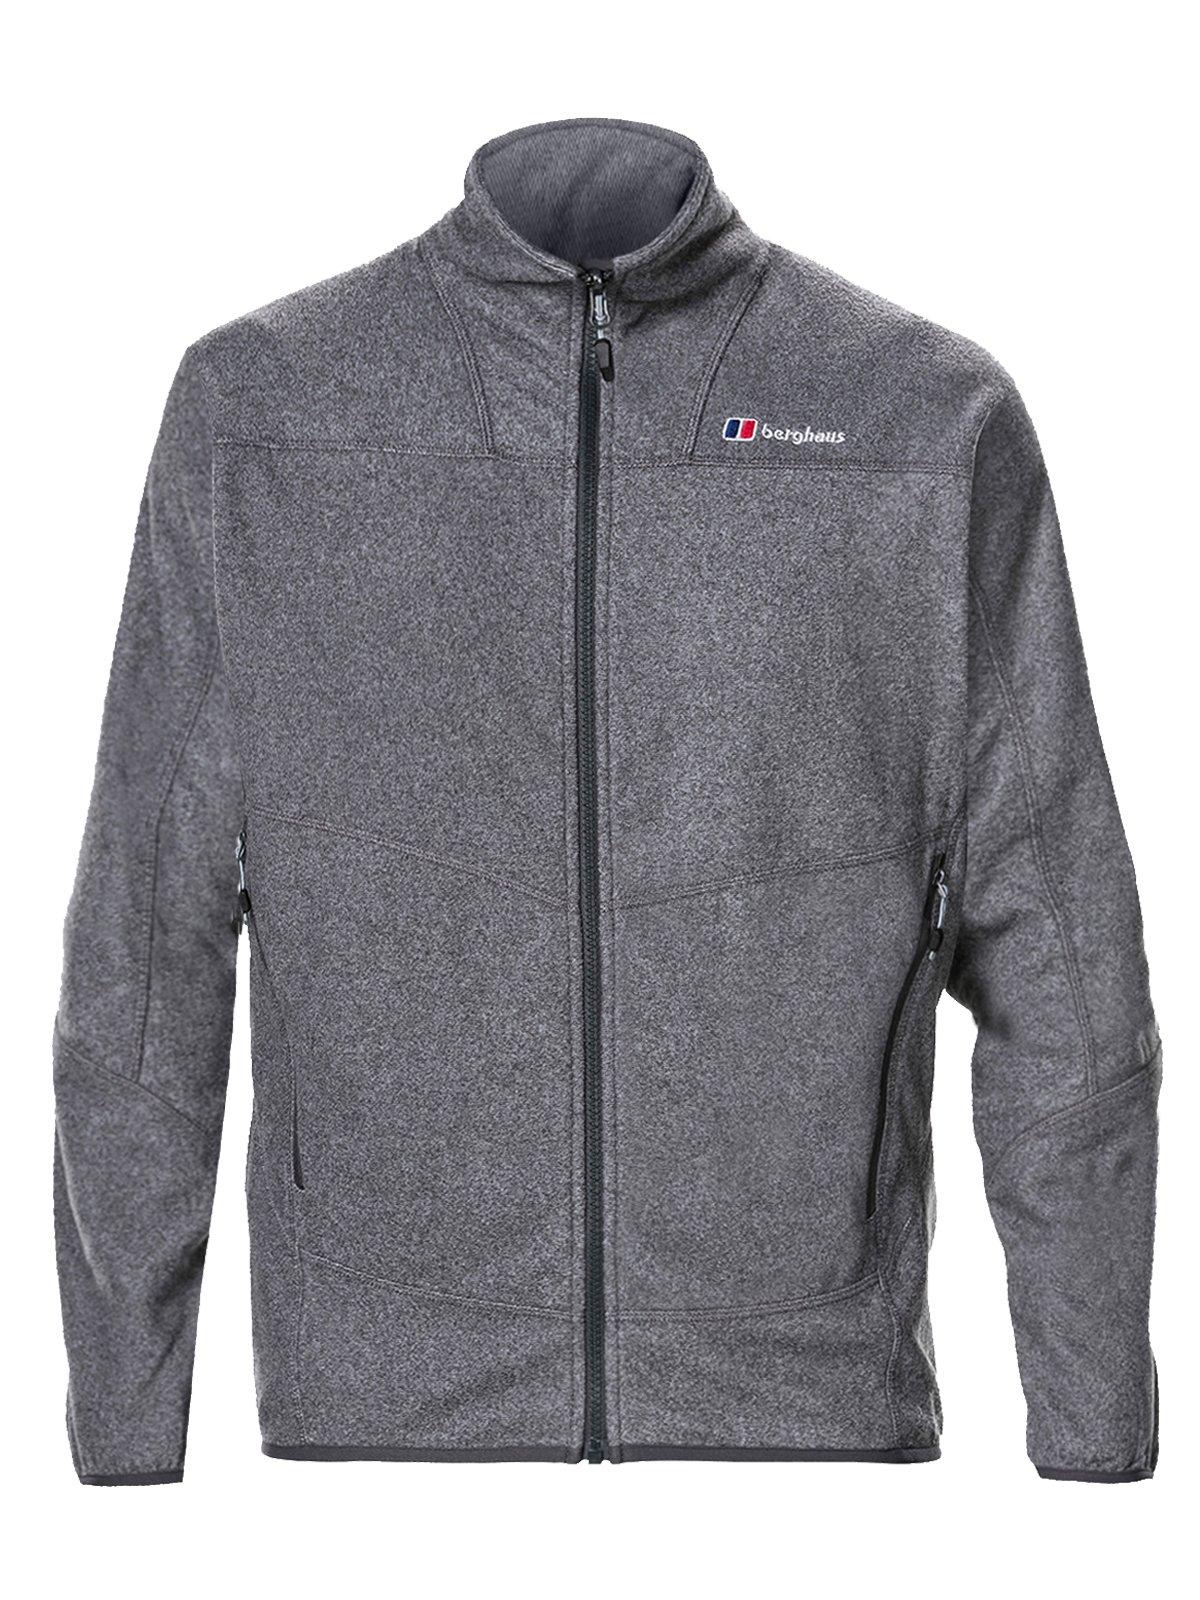 Berghaus Mens Spectrum Micro 2.0 Full Zip Fleece Jacket 1